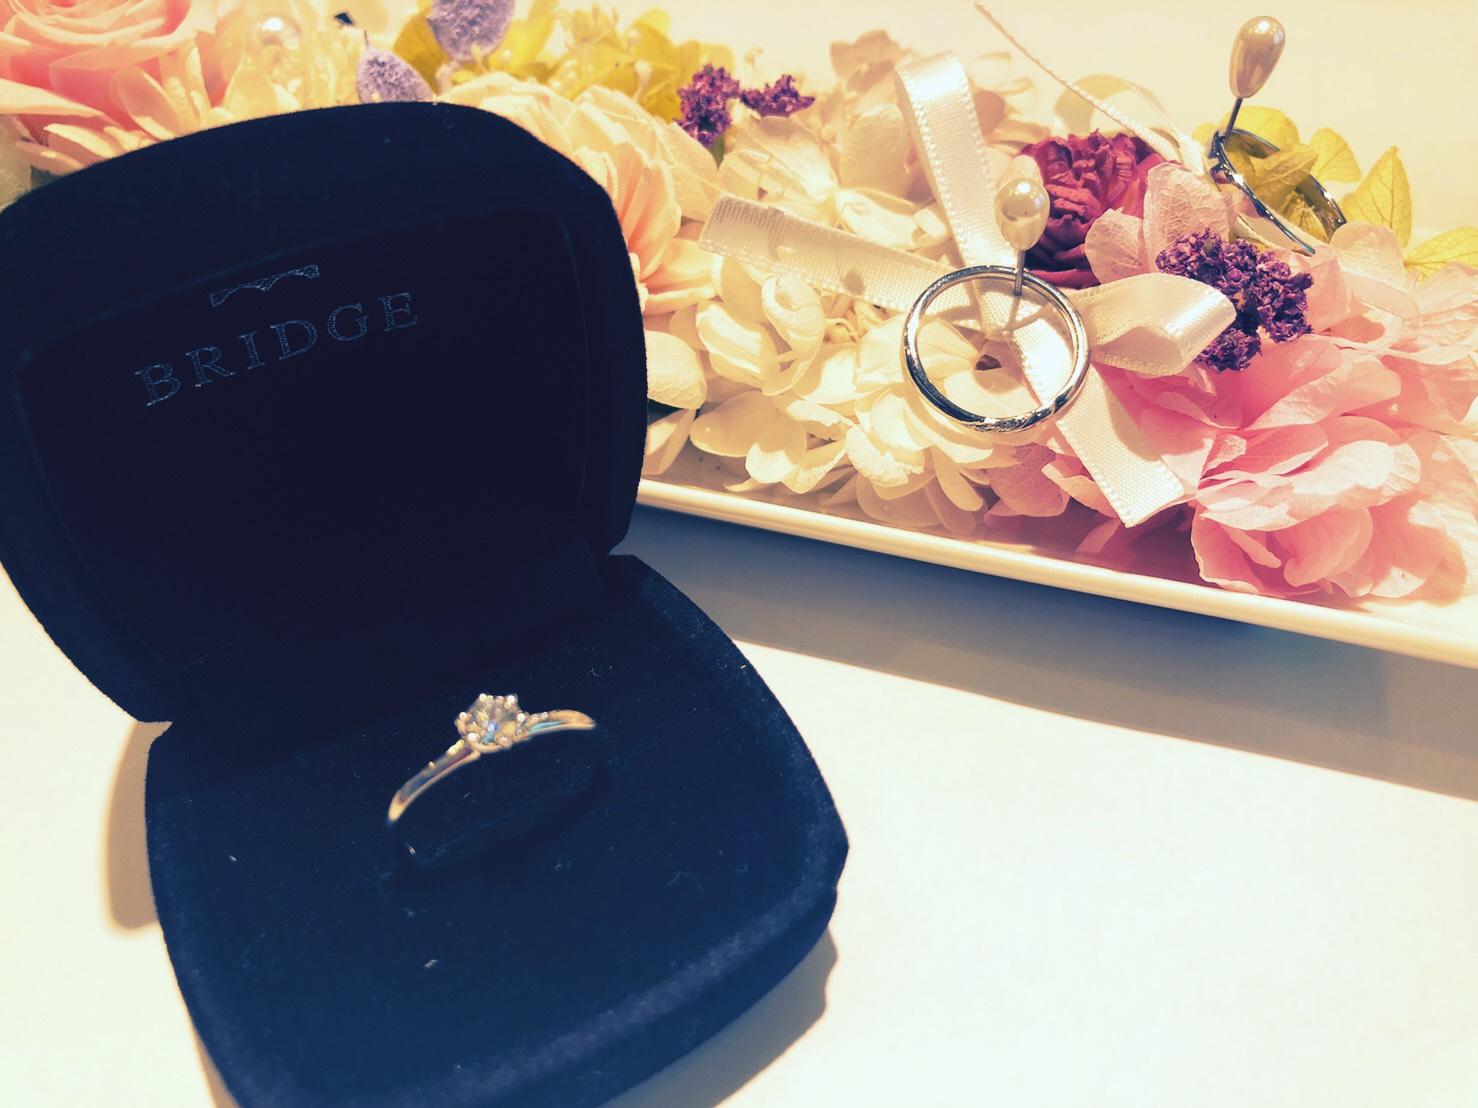 Cheerful   ダイヤモンドの美しさに圧倒されました!